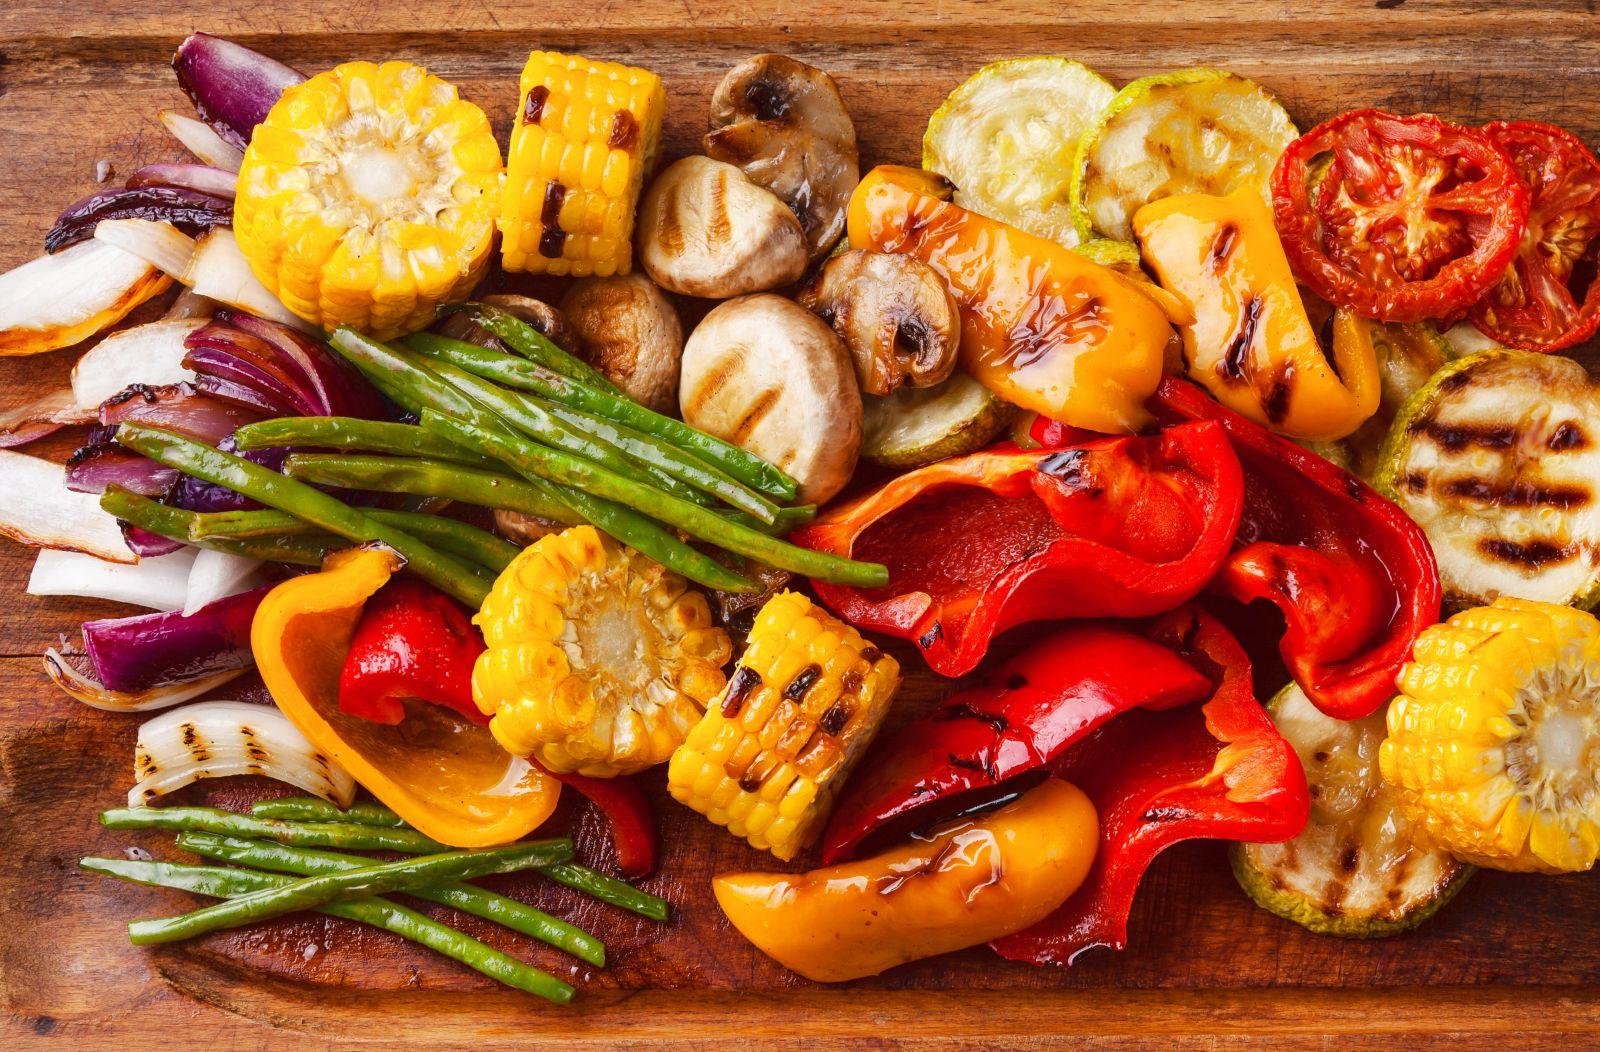 Leckere gesunde Grillrezepte